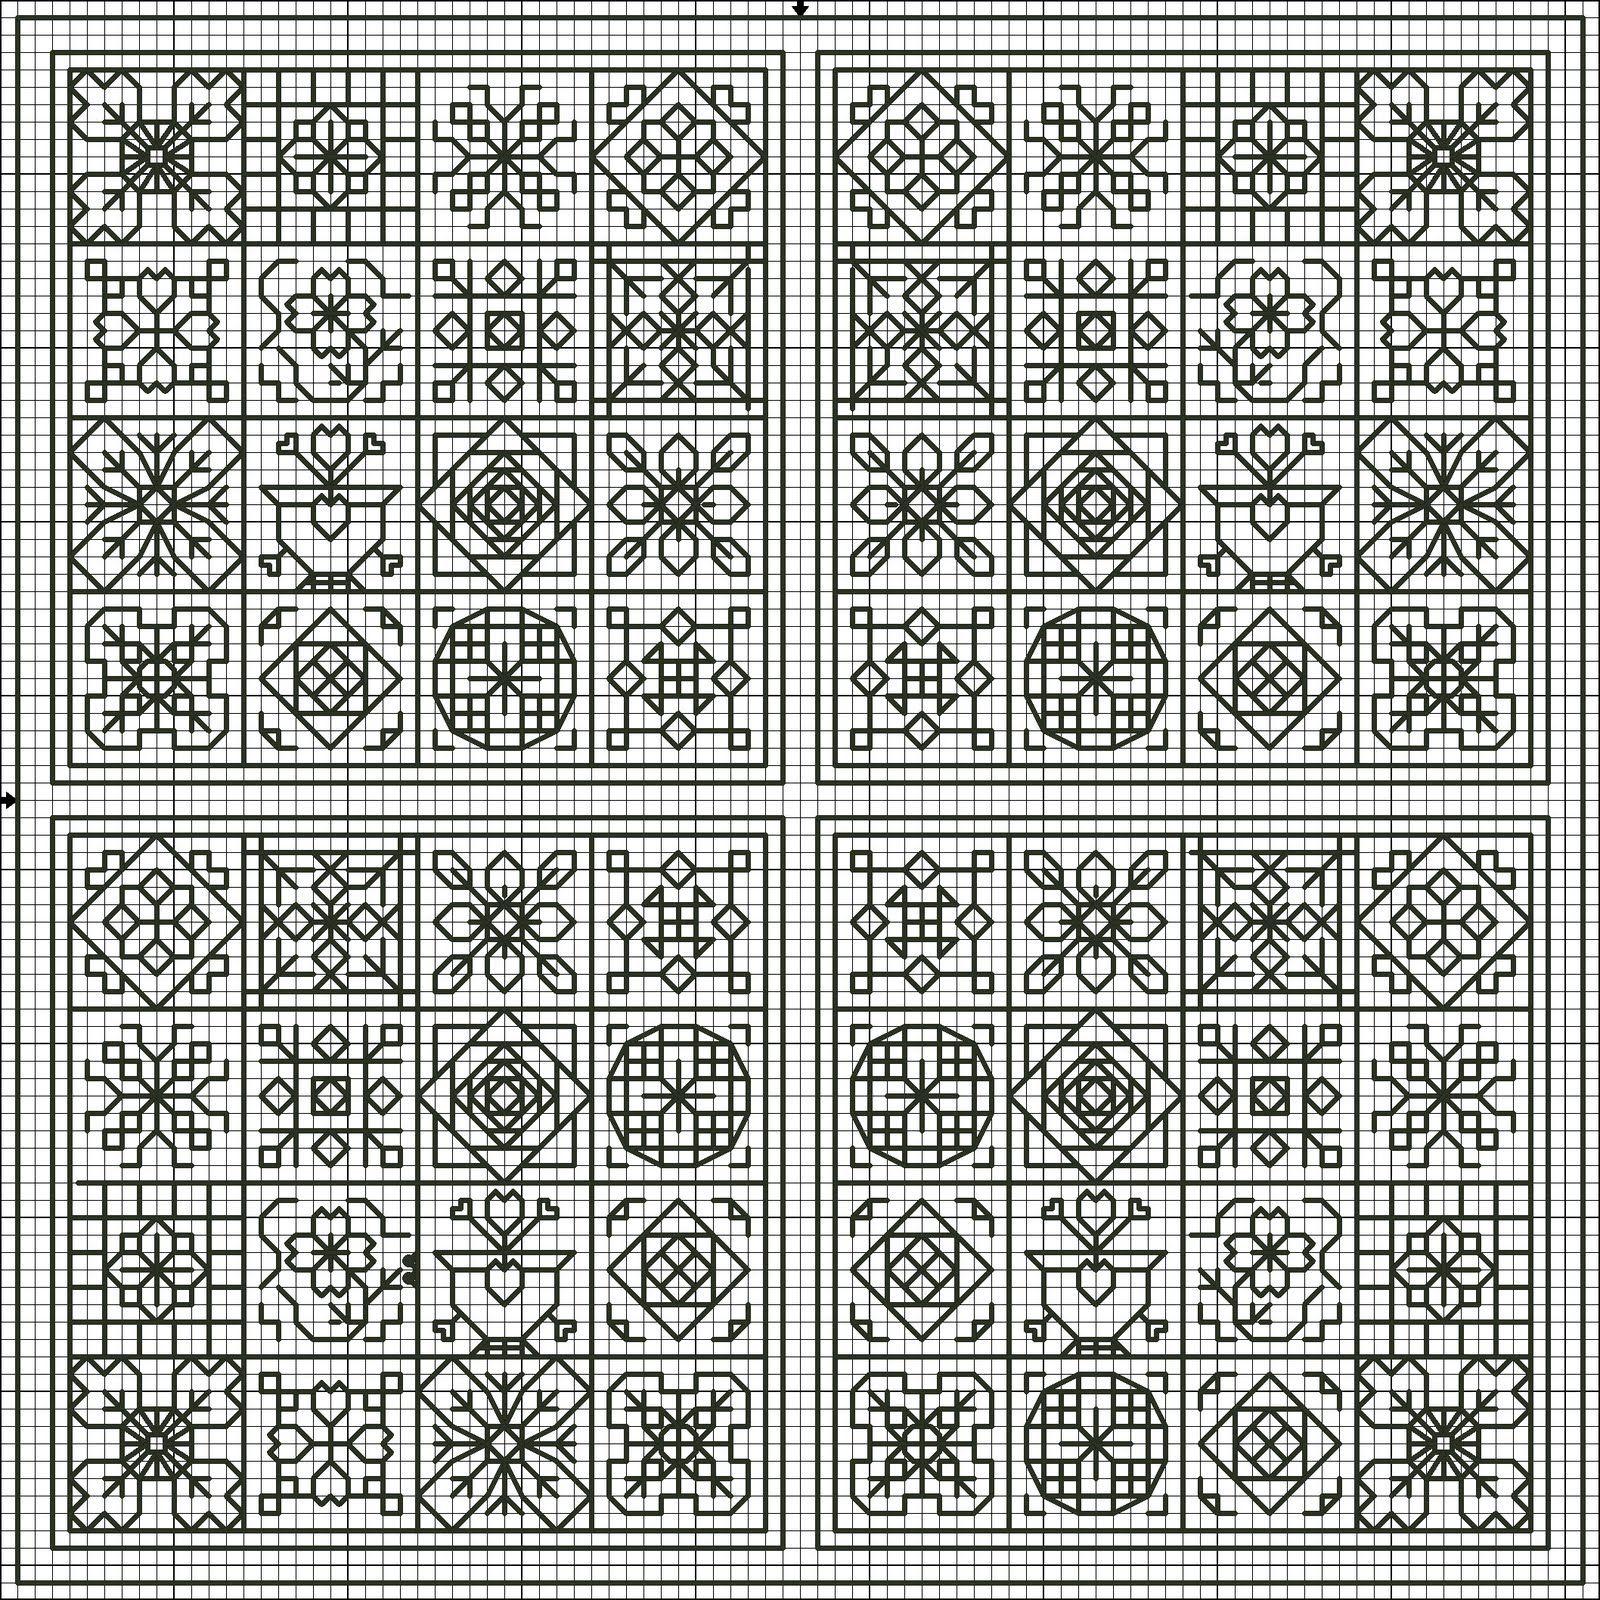 Blackwork Patterns Interesting Design Ideas